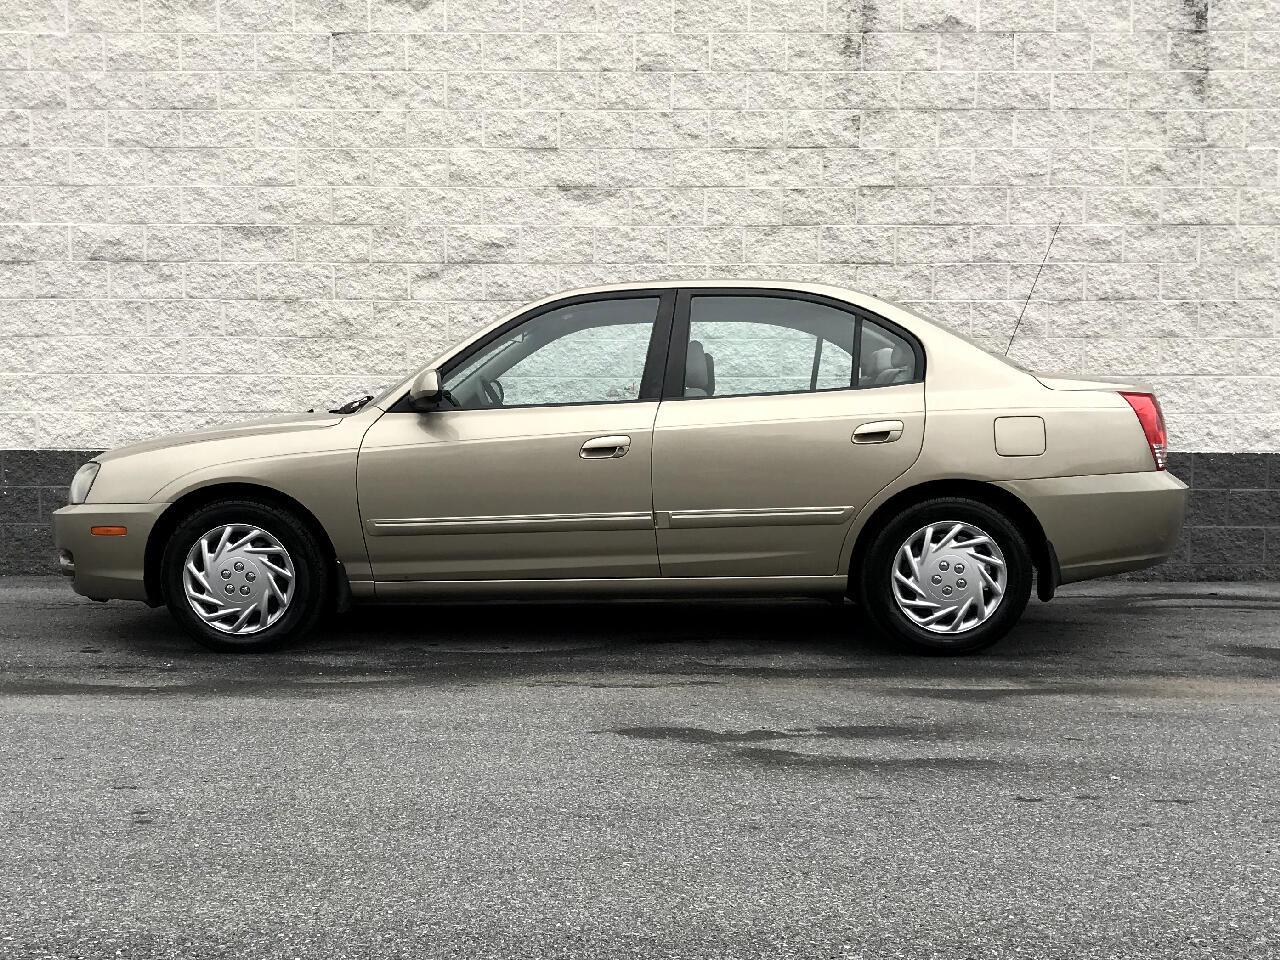 2006 Hyundai Elantra 4dr Sdn Auto GLS